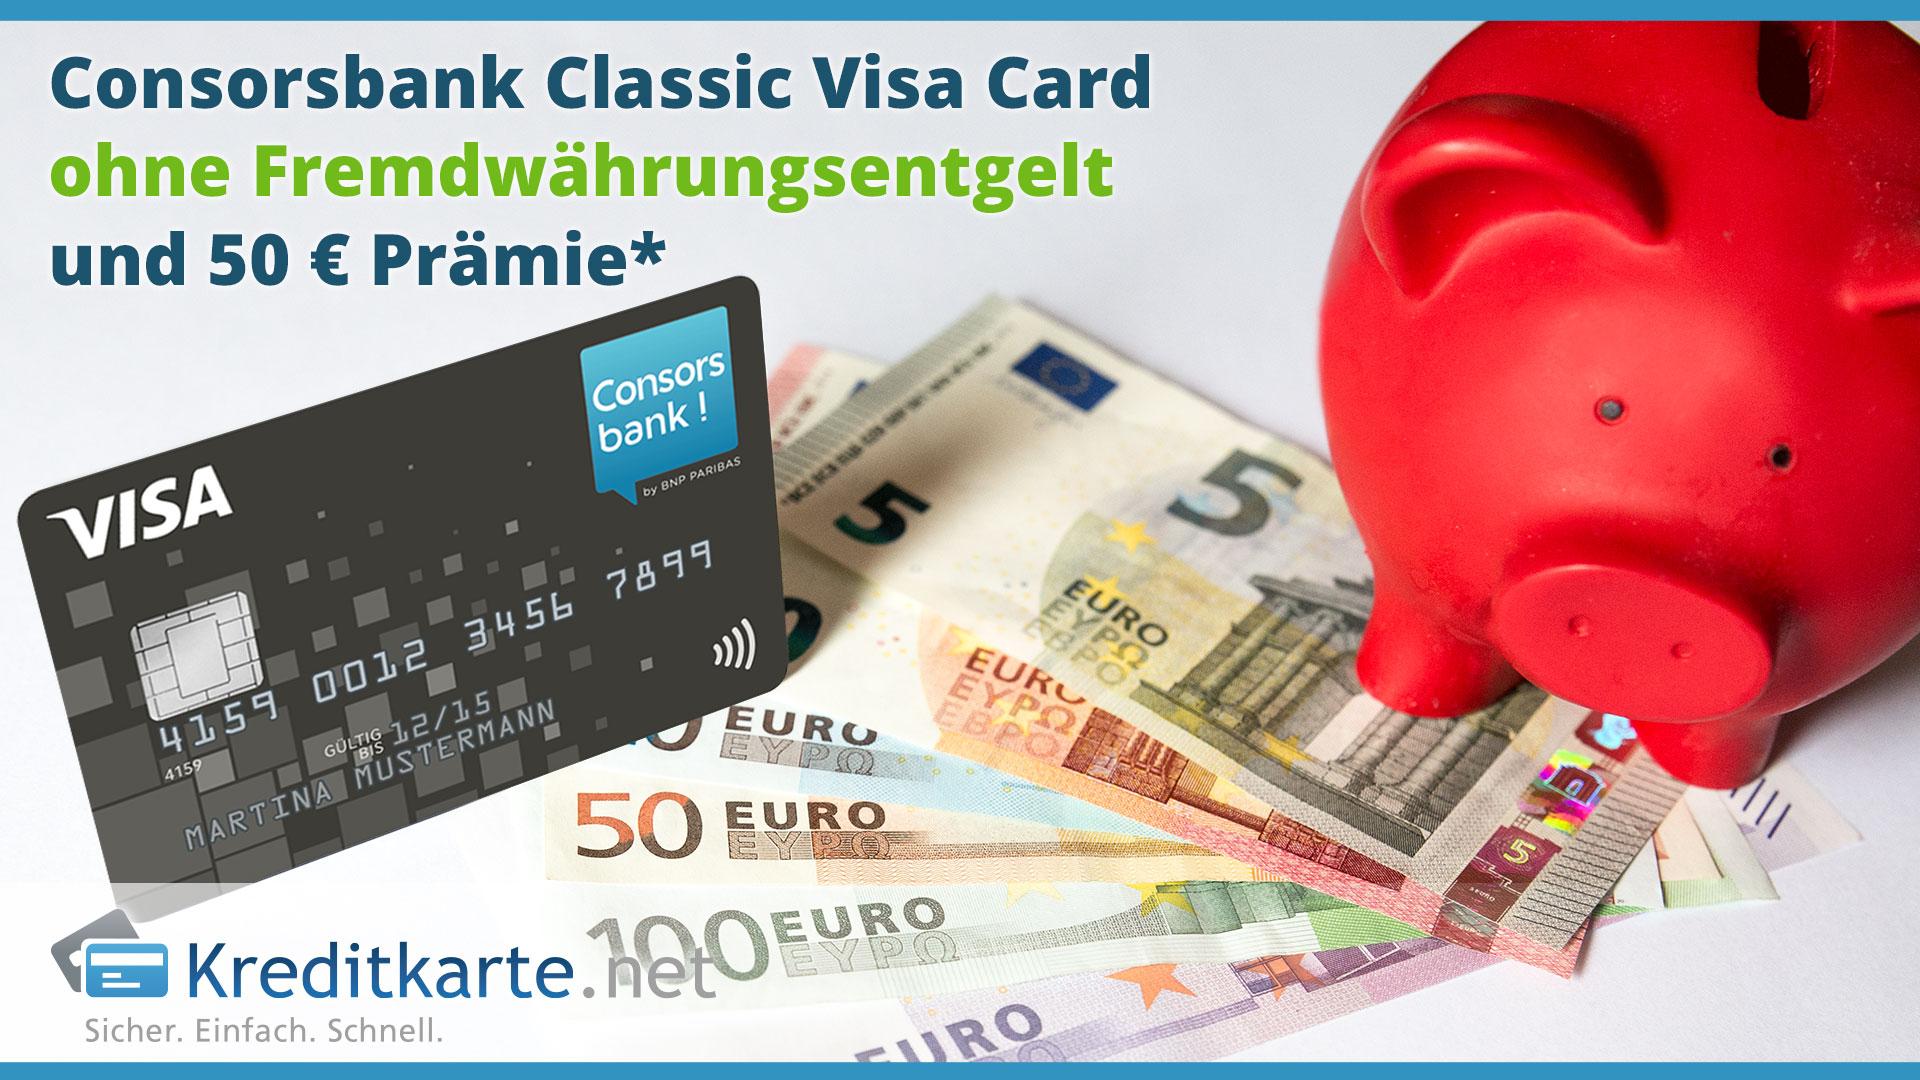 kreditkarte net